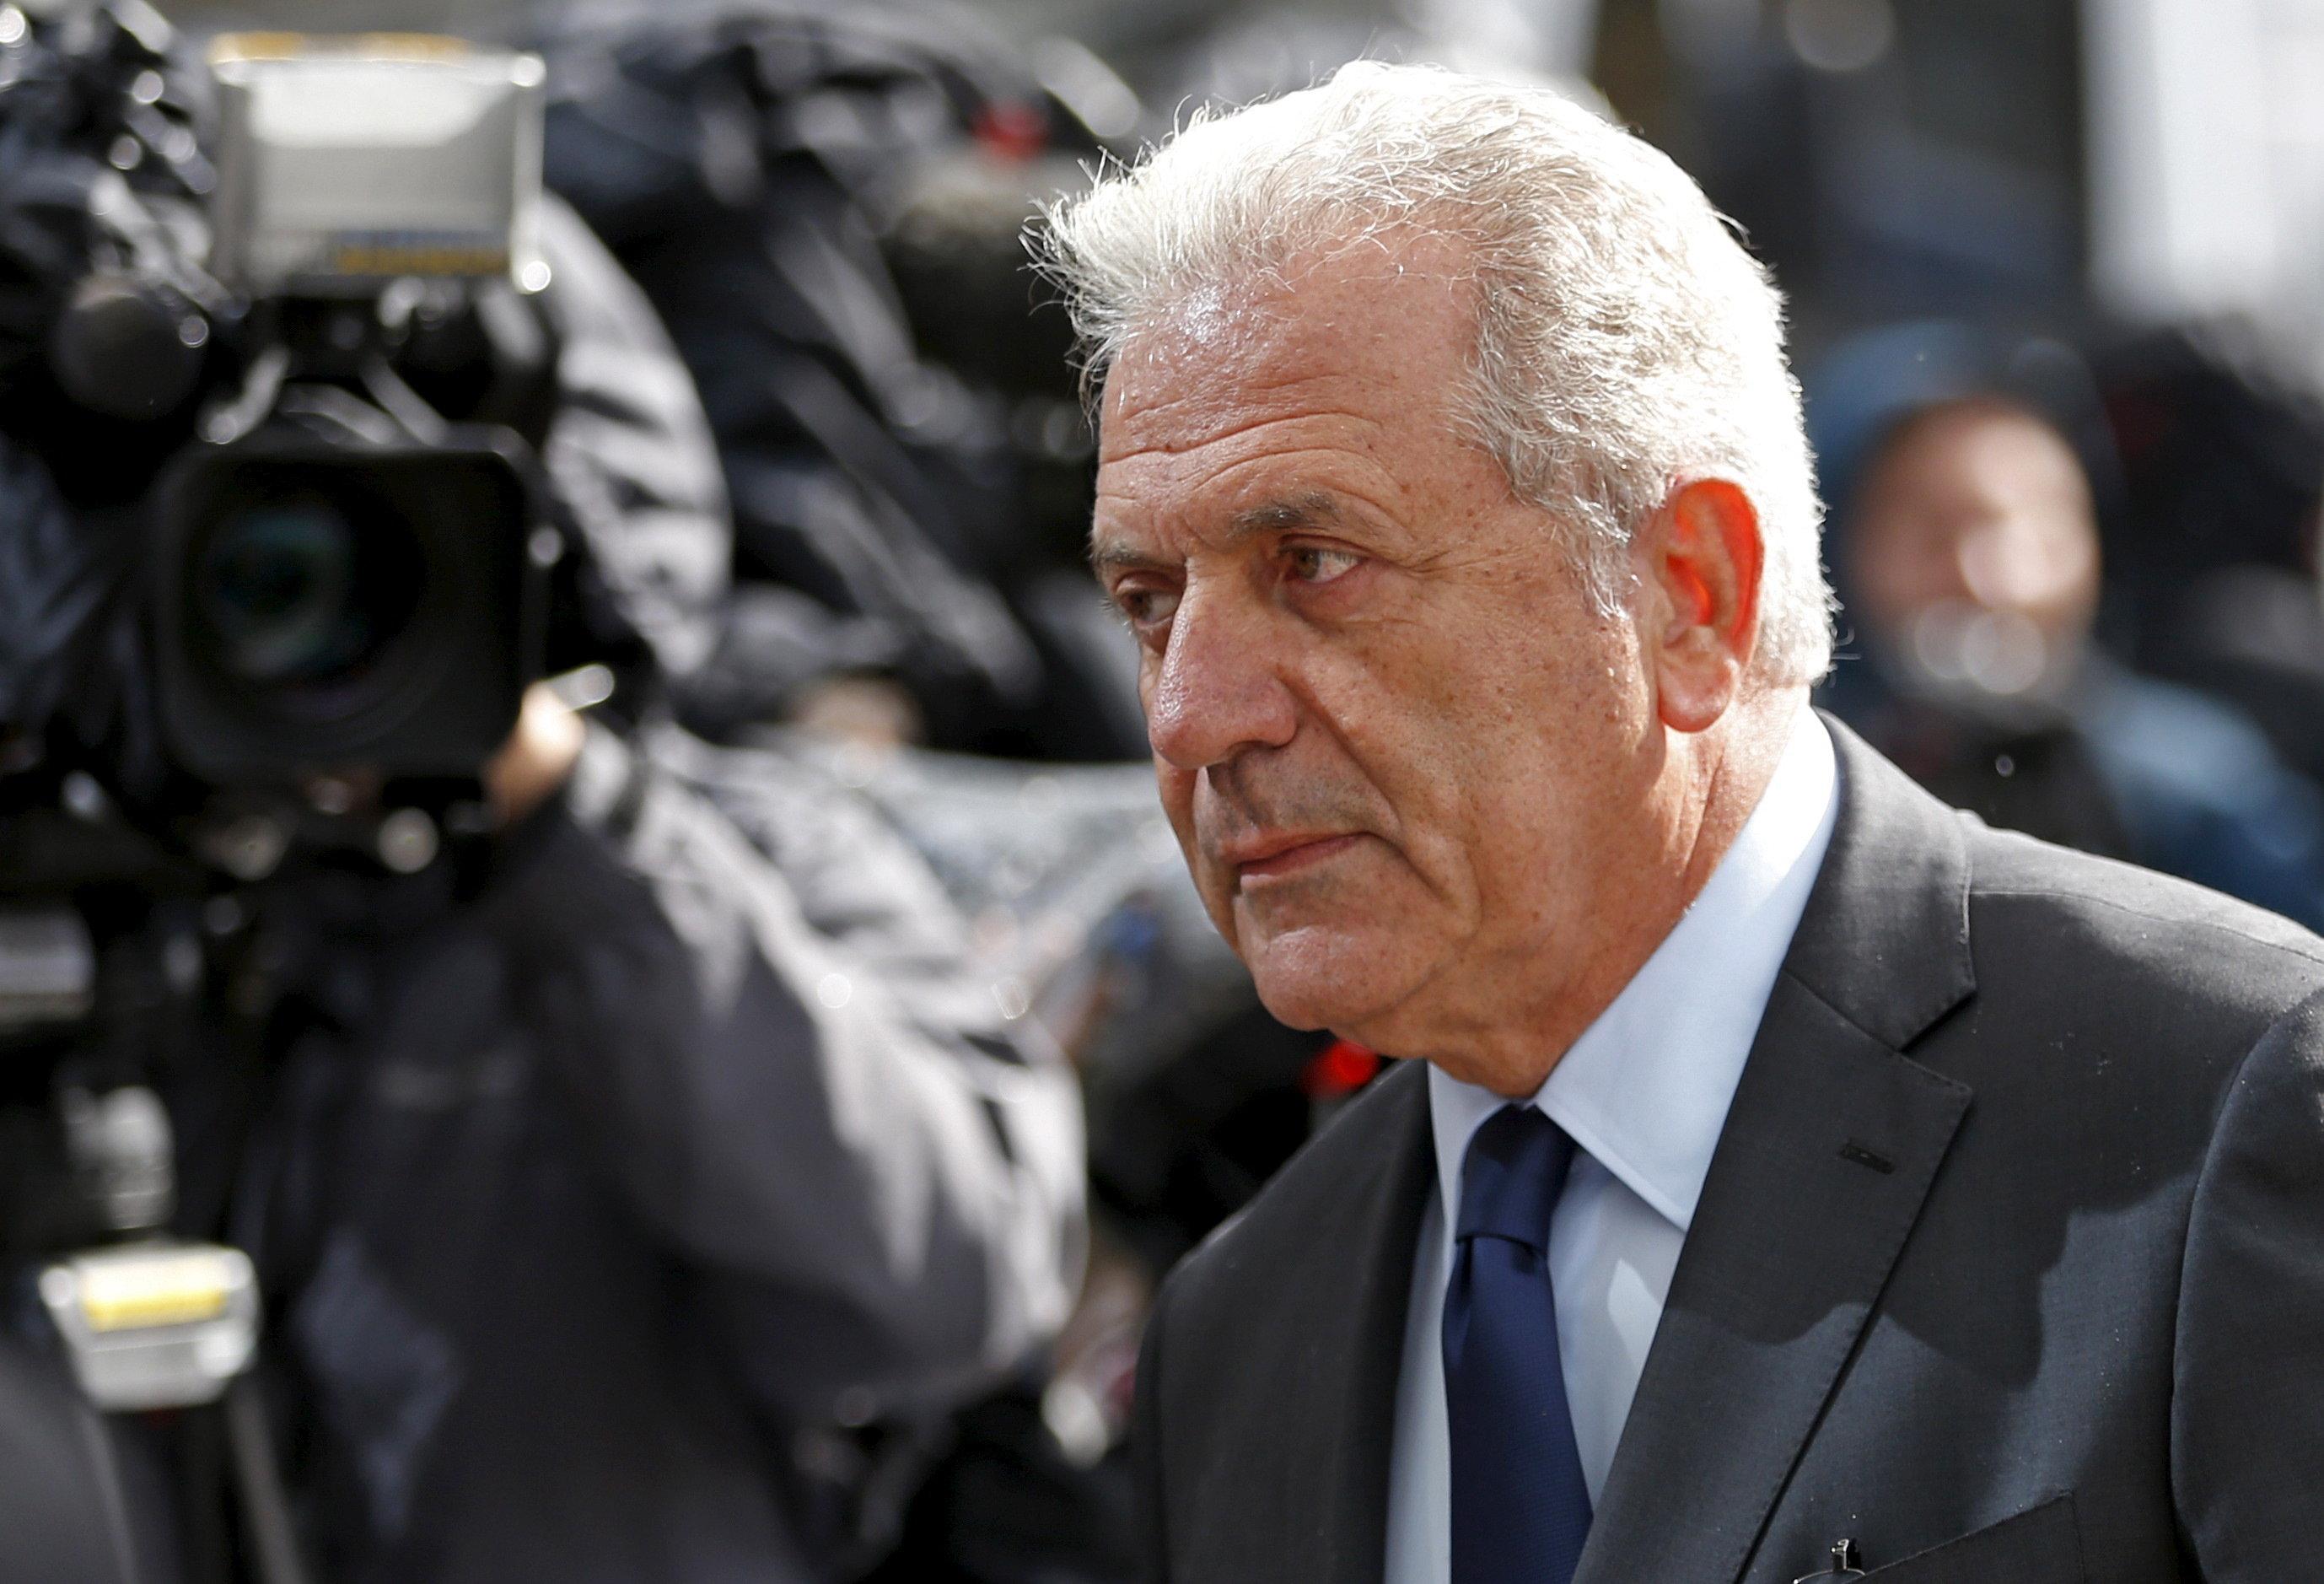 Politico: Αβραμόπουλος, ο Ευρωπαίος Επίτροπος που ανάγκασε τον Τουσκ να αναθεωρήσει τα σχέδιά του για...